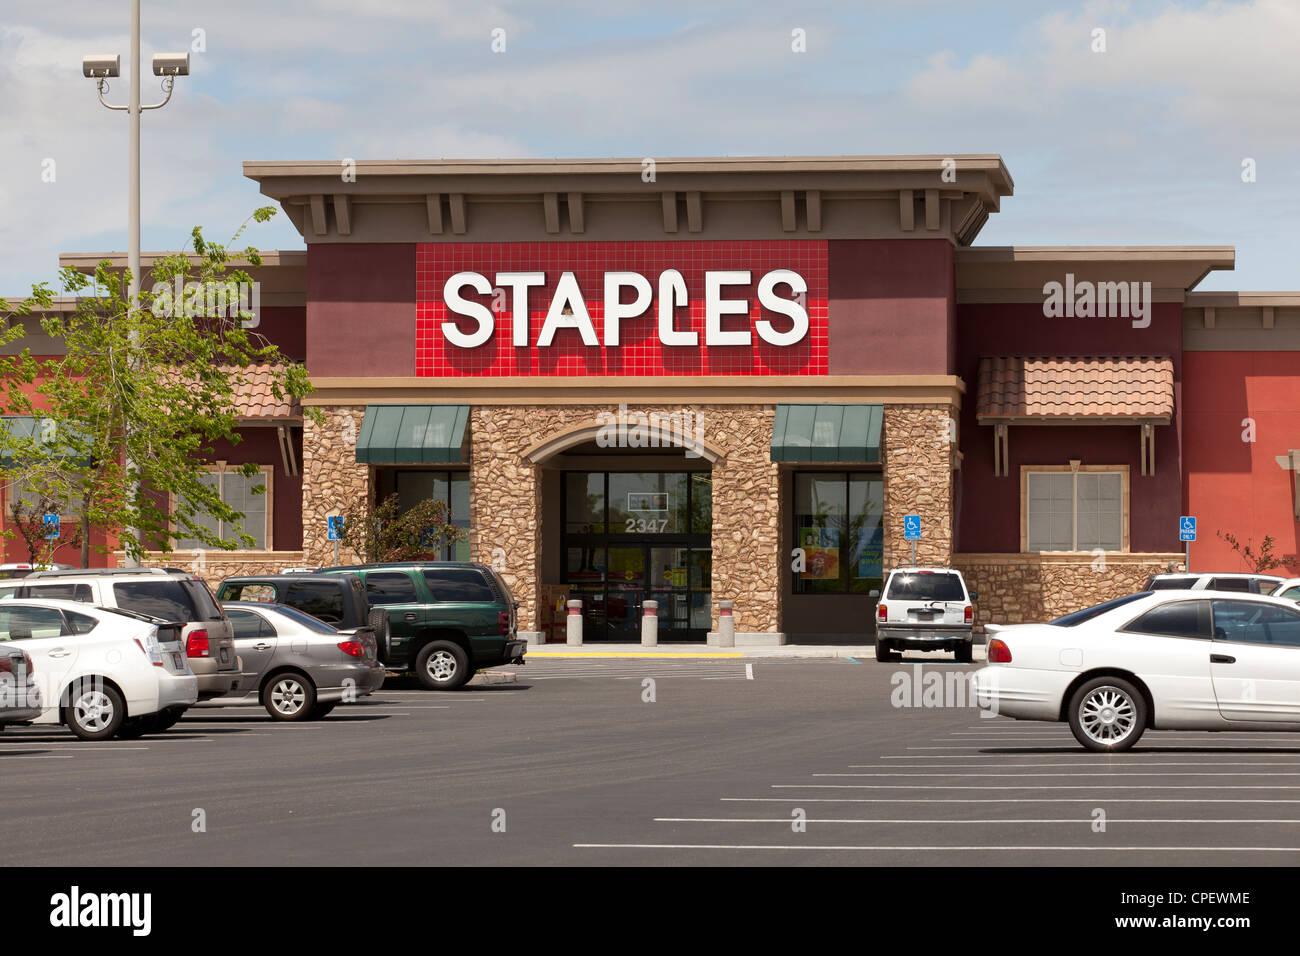 Staples storefront - USA - Stock Image